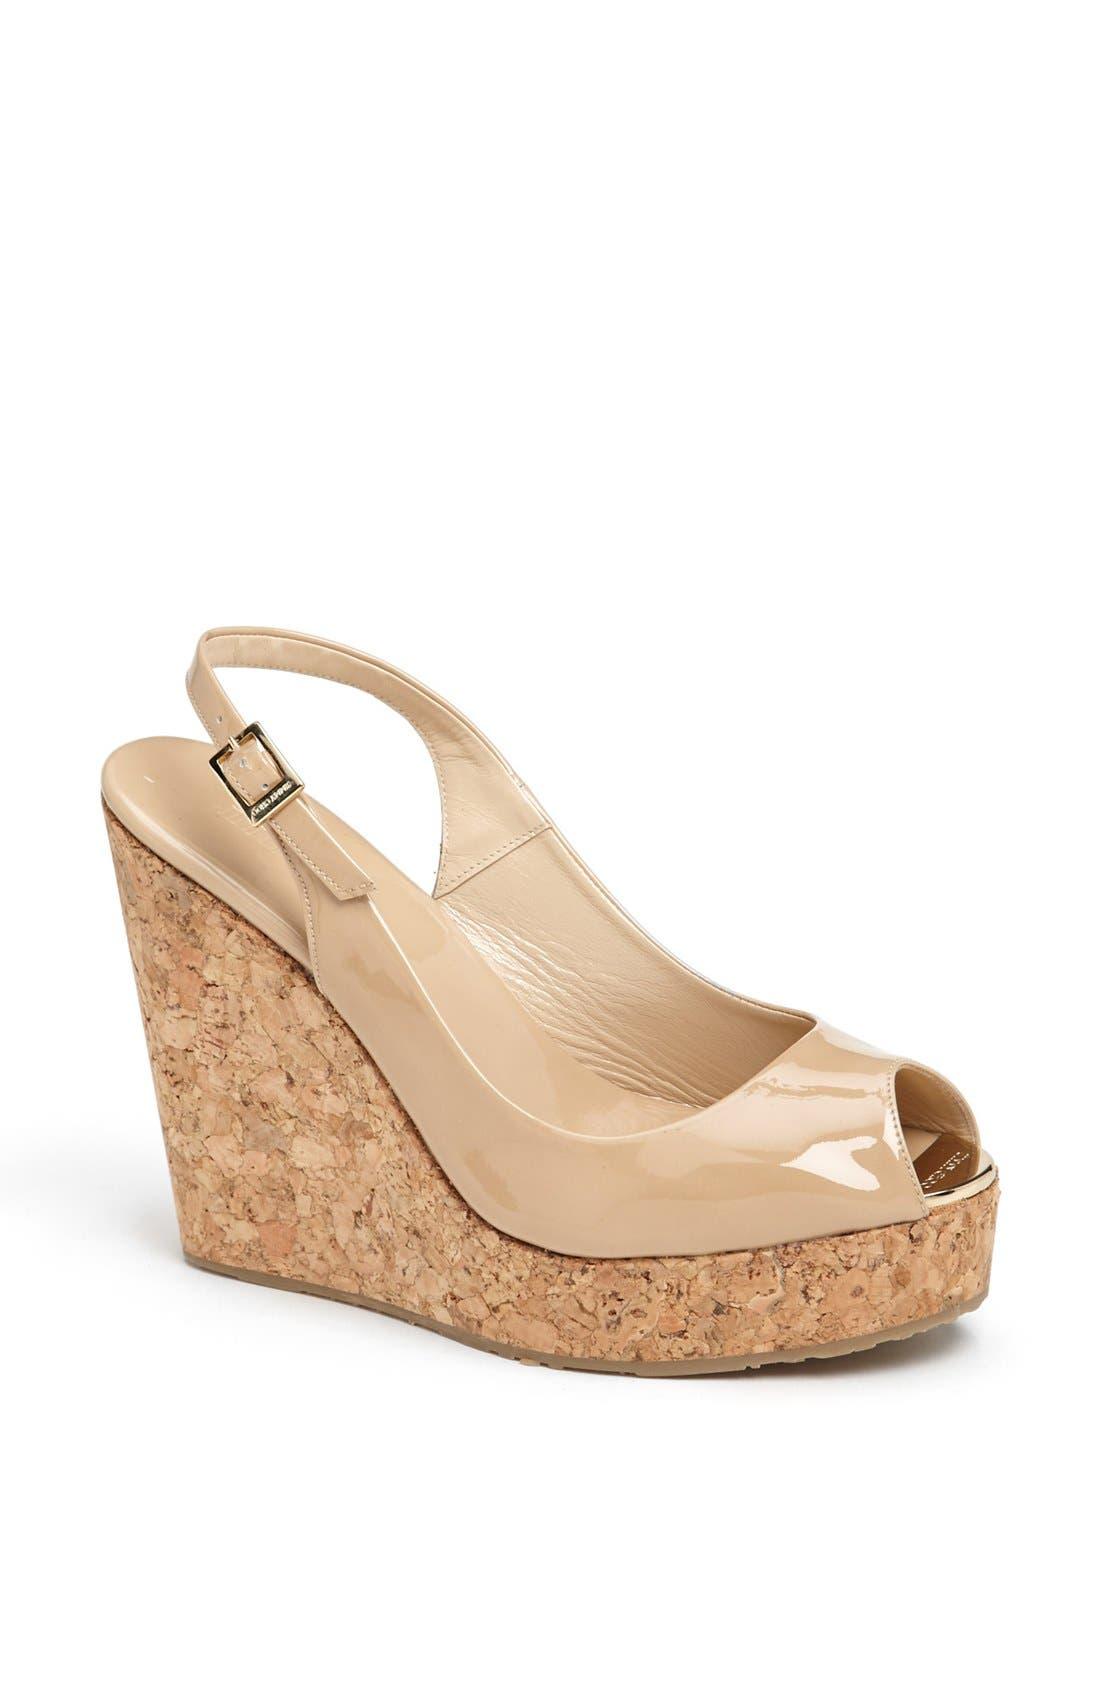 'Prova' Cork Slingback Wedge Sandal,                         Main,                         color, 270